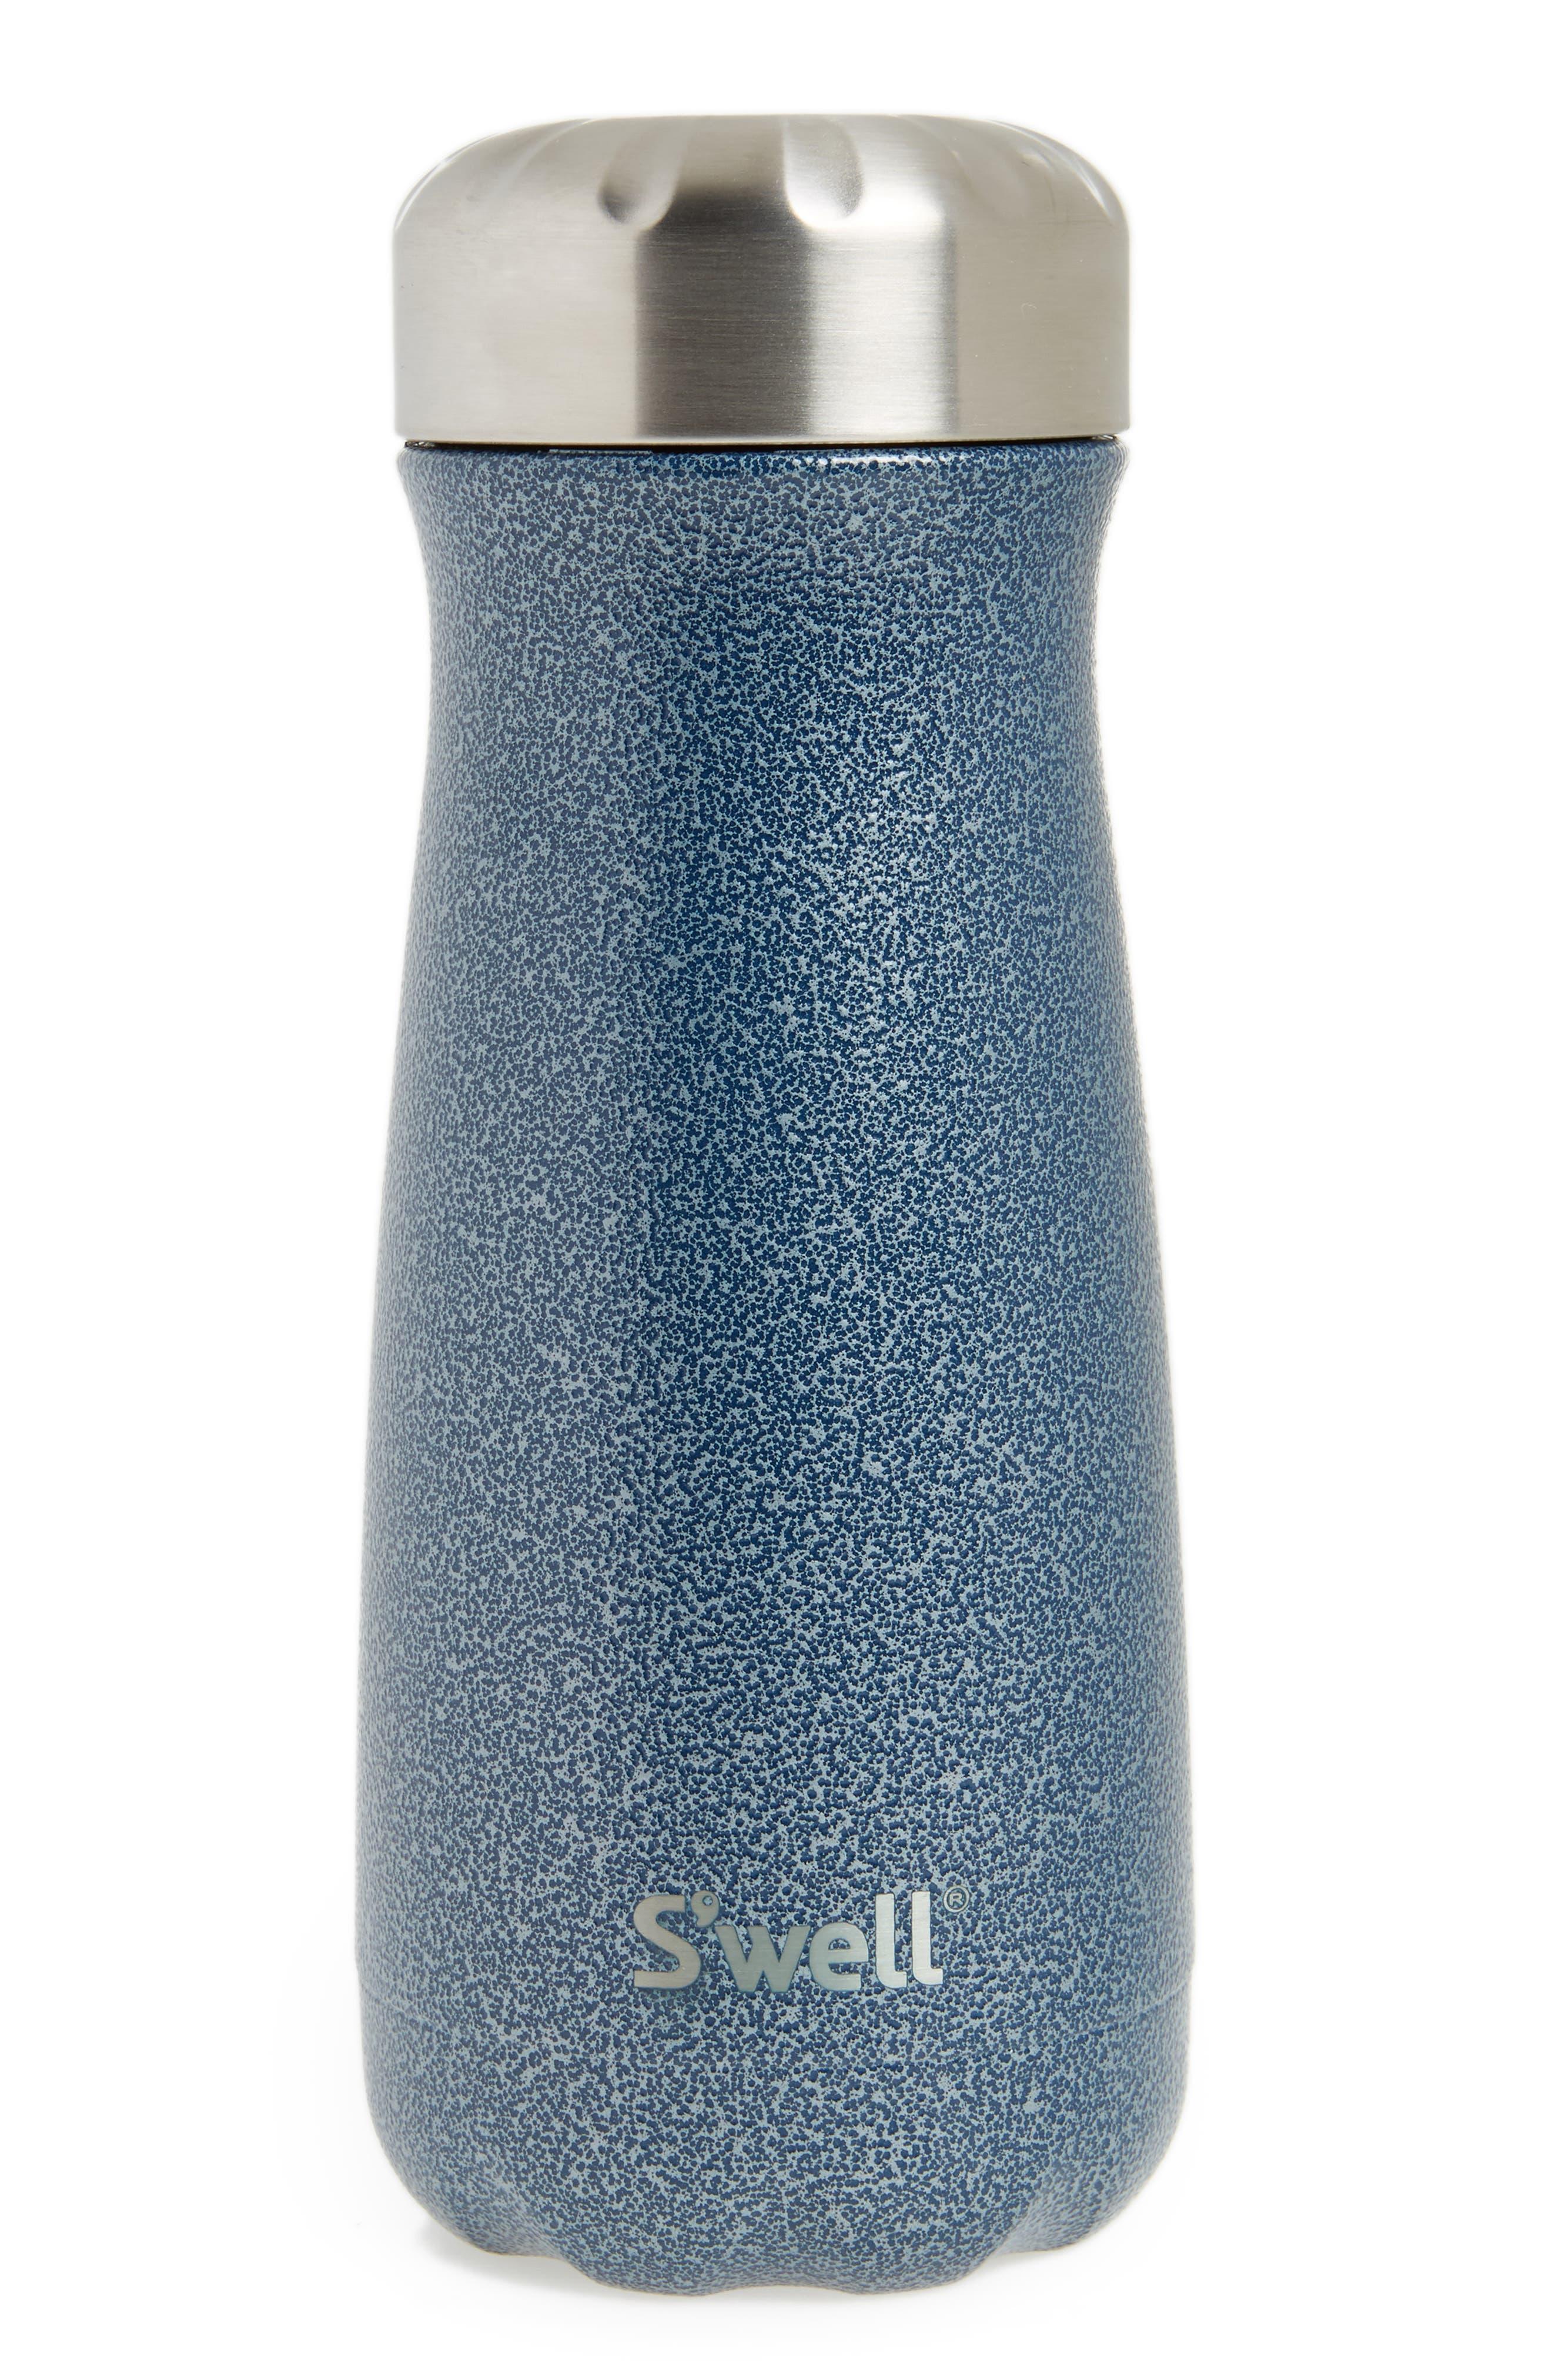 Alternate Image 1 Selected - S'well Night Sky 16-Ounce Insulated Traveler Bottle